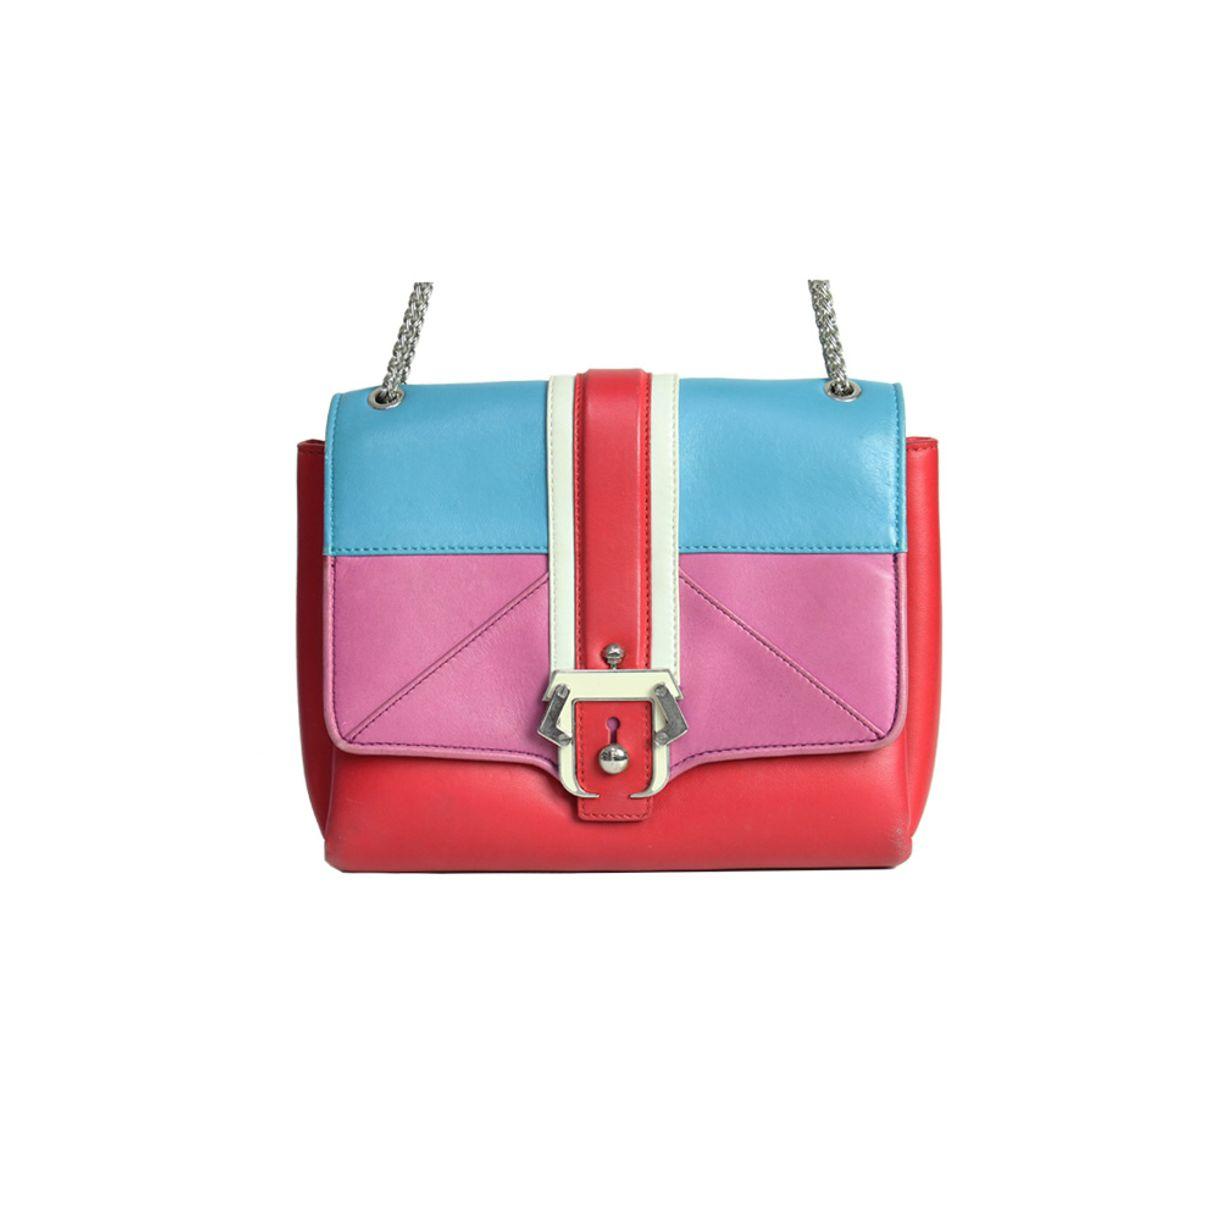 Bolsa-Paula-Cademartori-Rosa-e-Azul